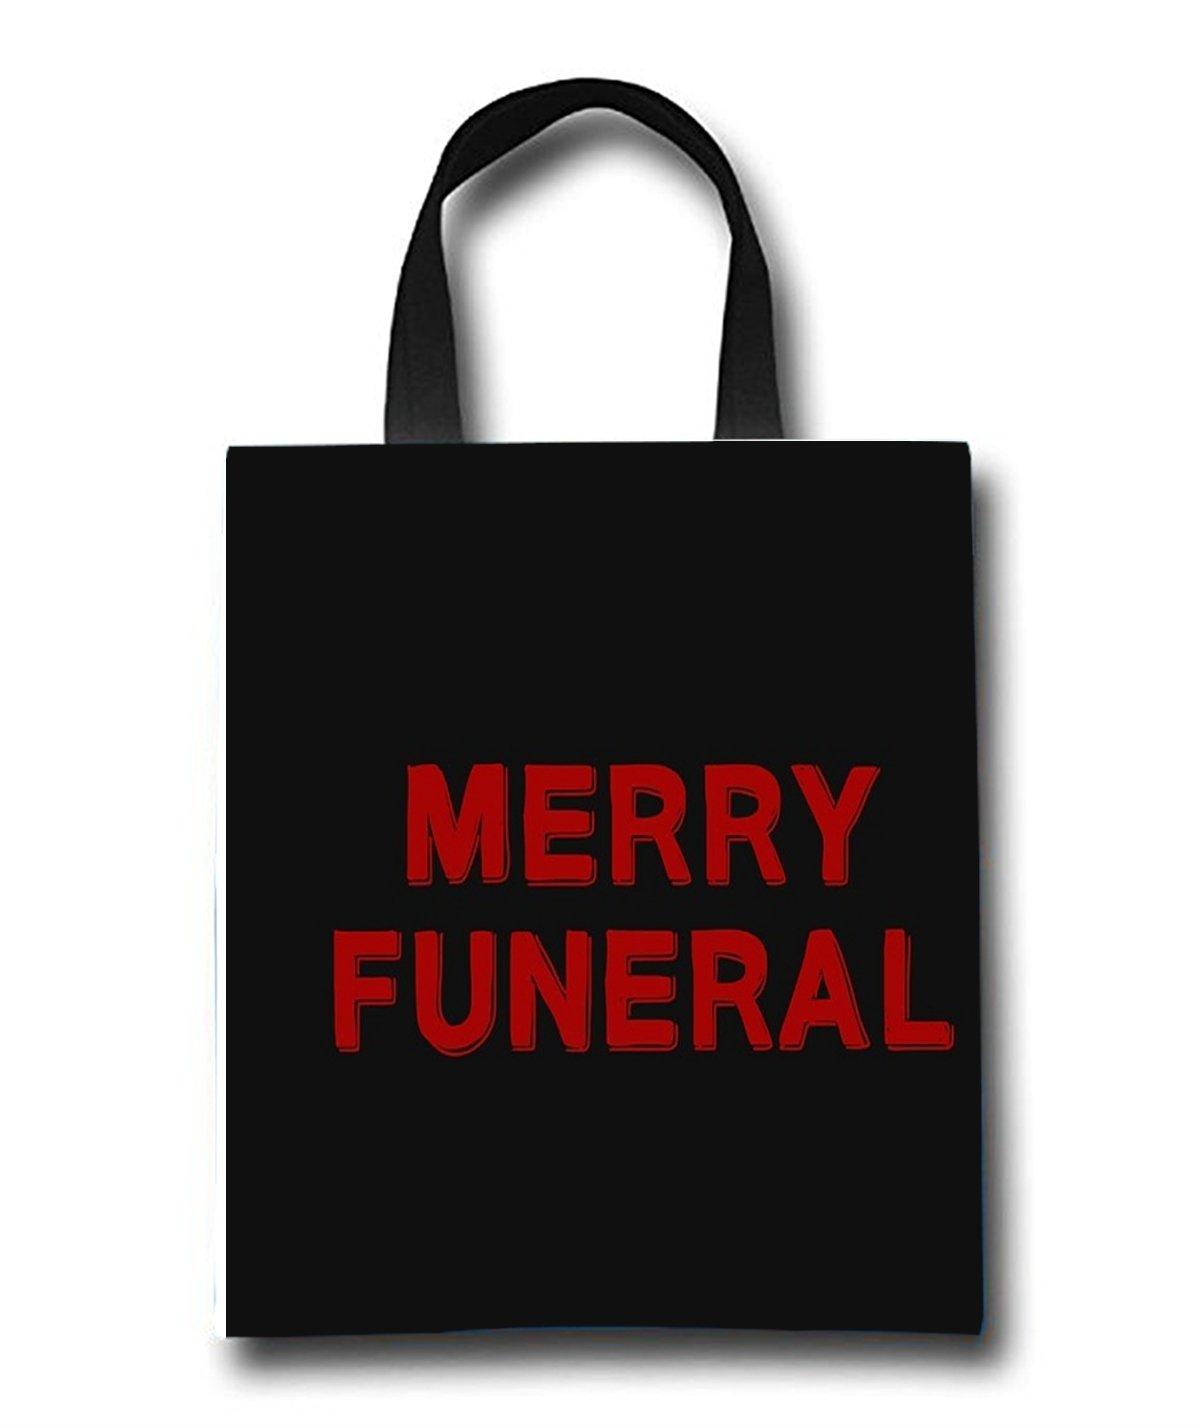 b89b624adea5 Amazon.com : Merry Funeral Reusable Shopping Bag Travel Shoulder ...